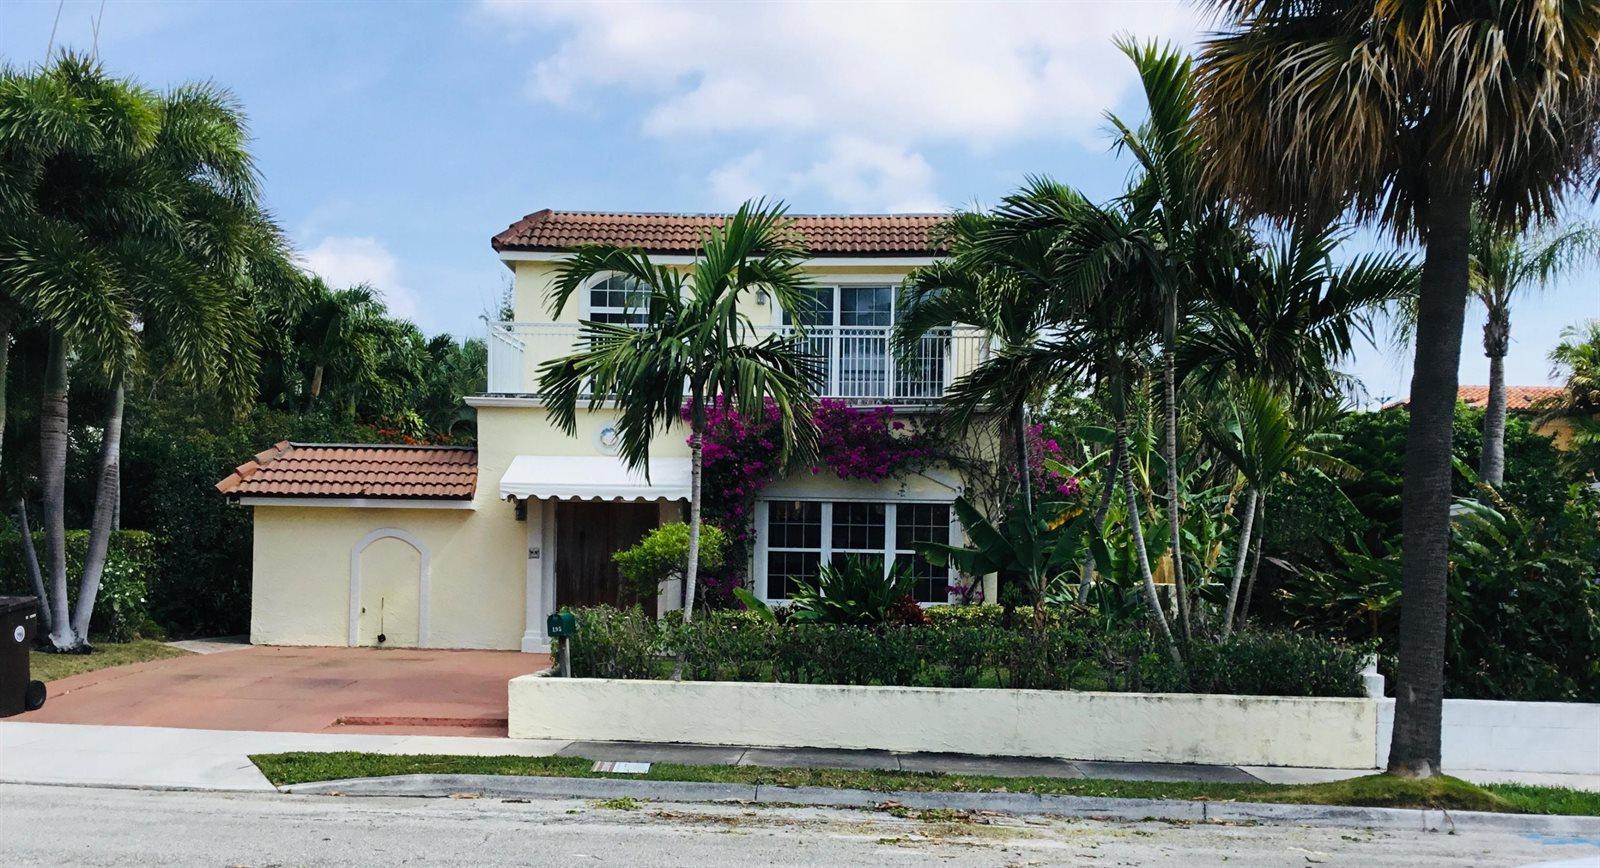 195 Almeria Road, West Palm Beach, FL 33405